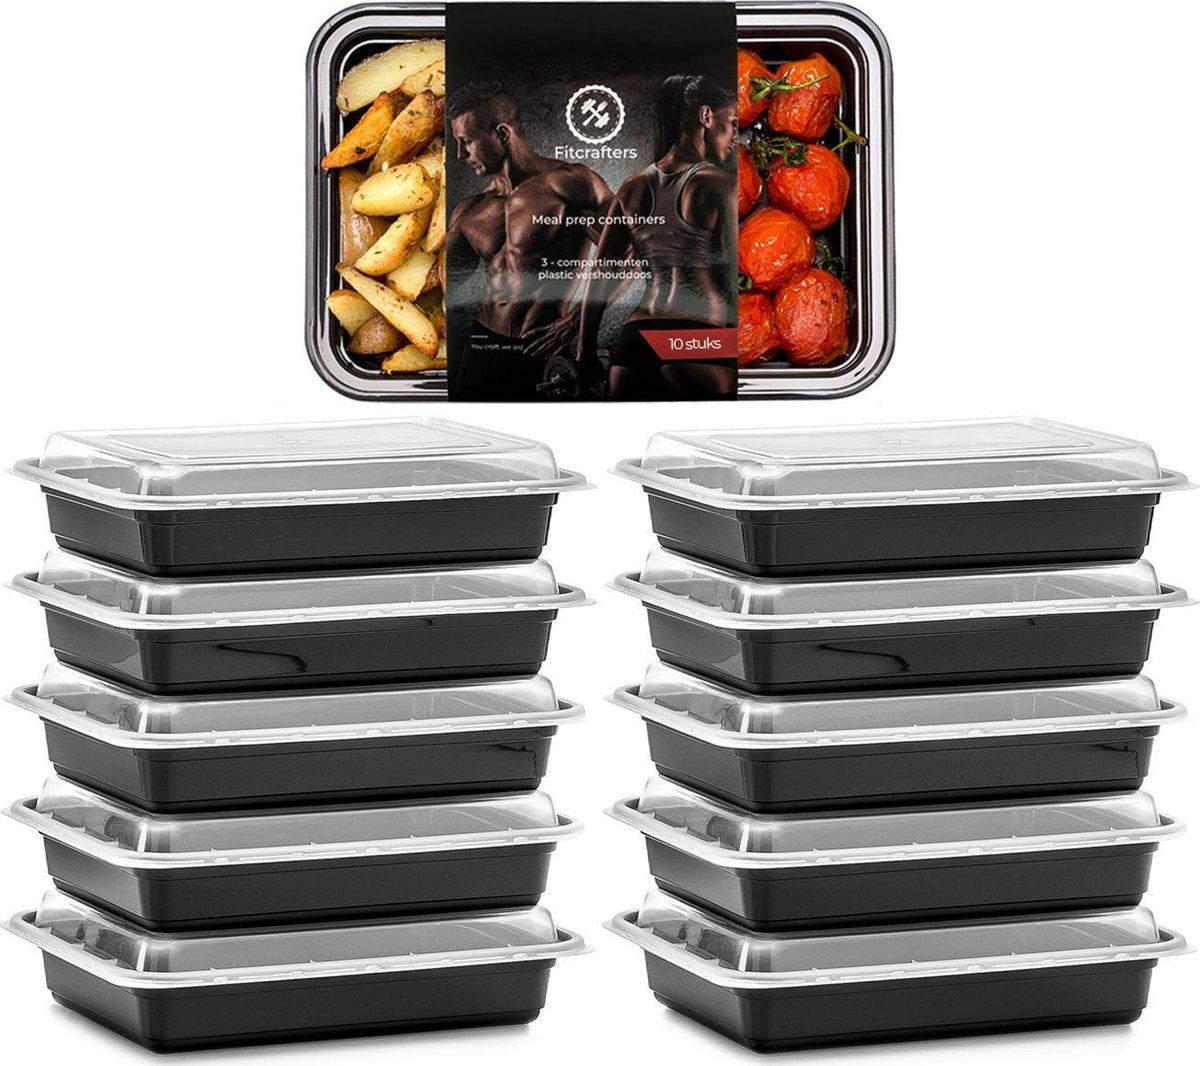 Meal Prep Bakjes - 10 stuks - 1 compartiment - Lunchbox - Diepvriesbakjes - Vershoudbakjes - Plastic